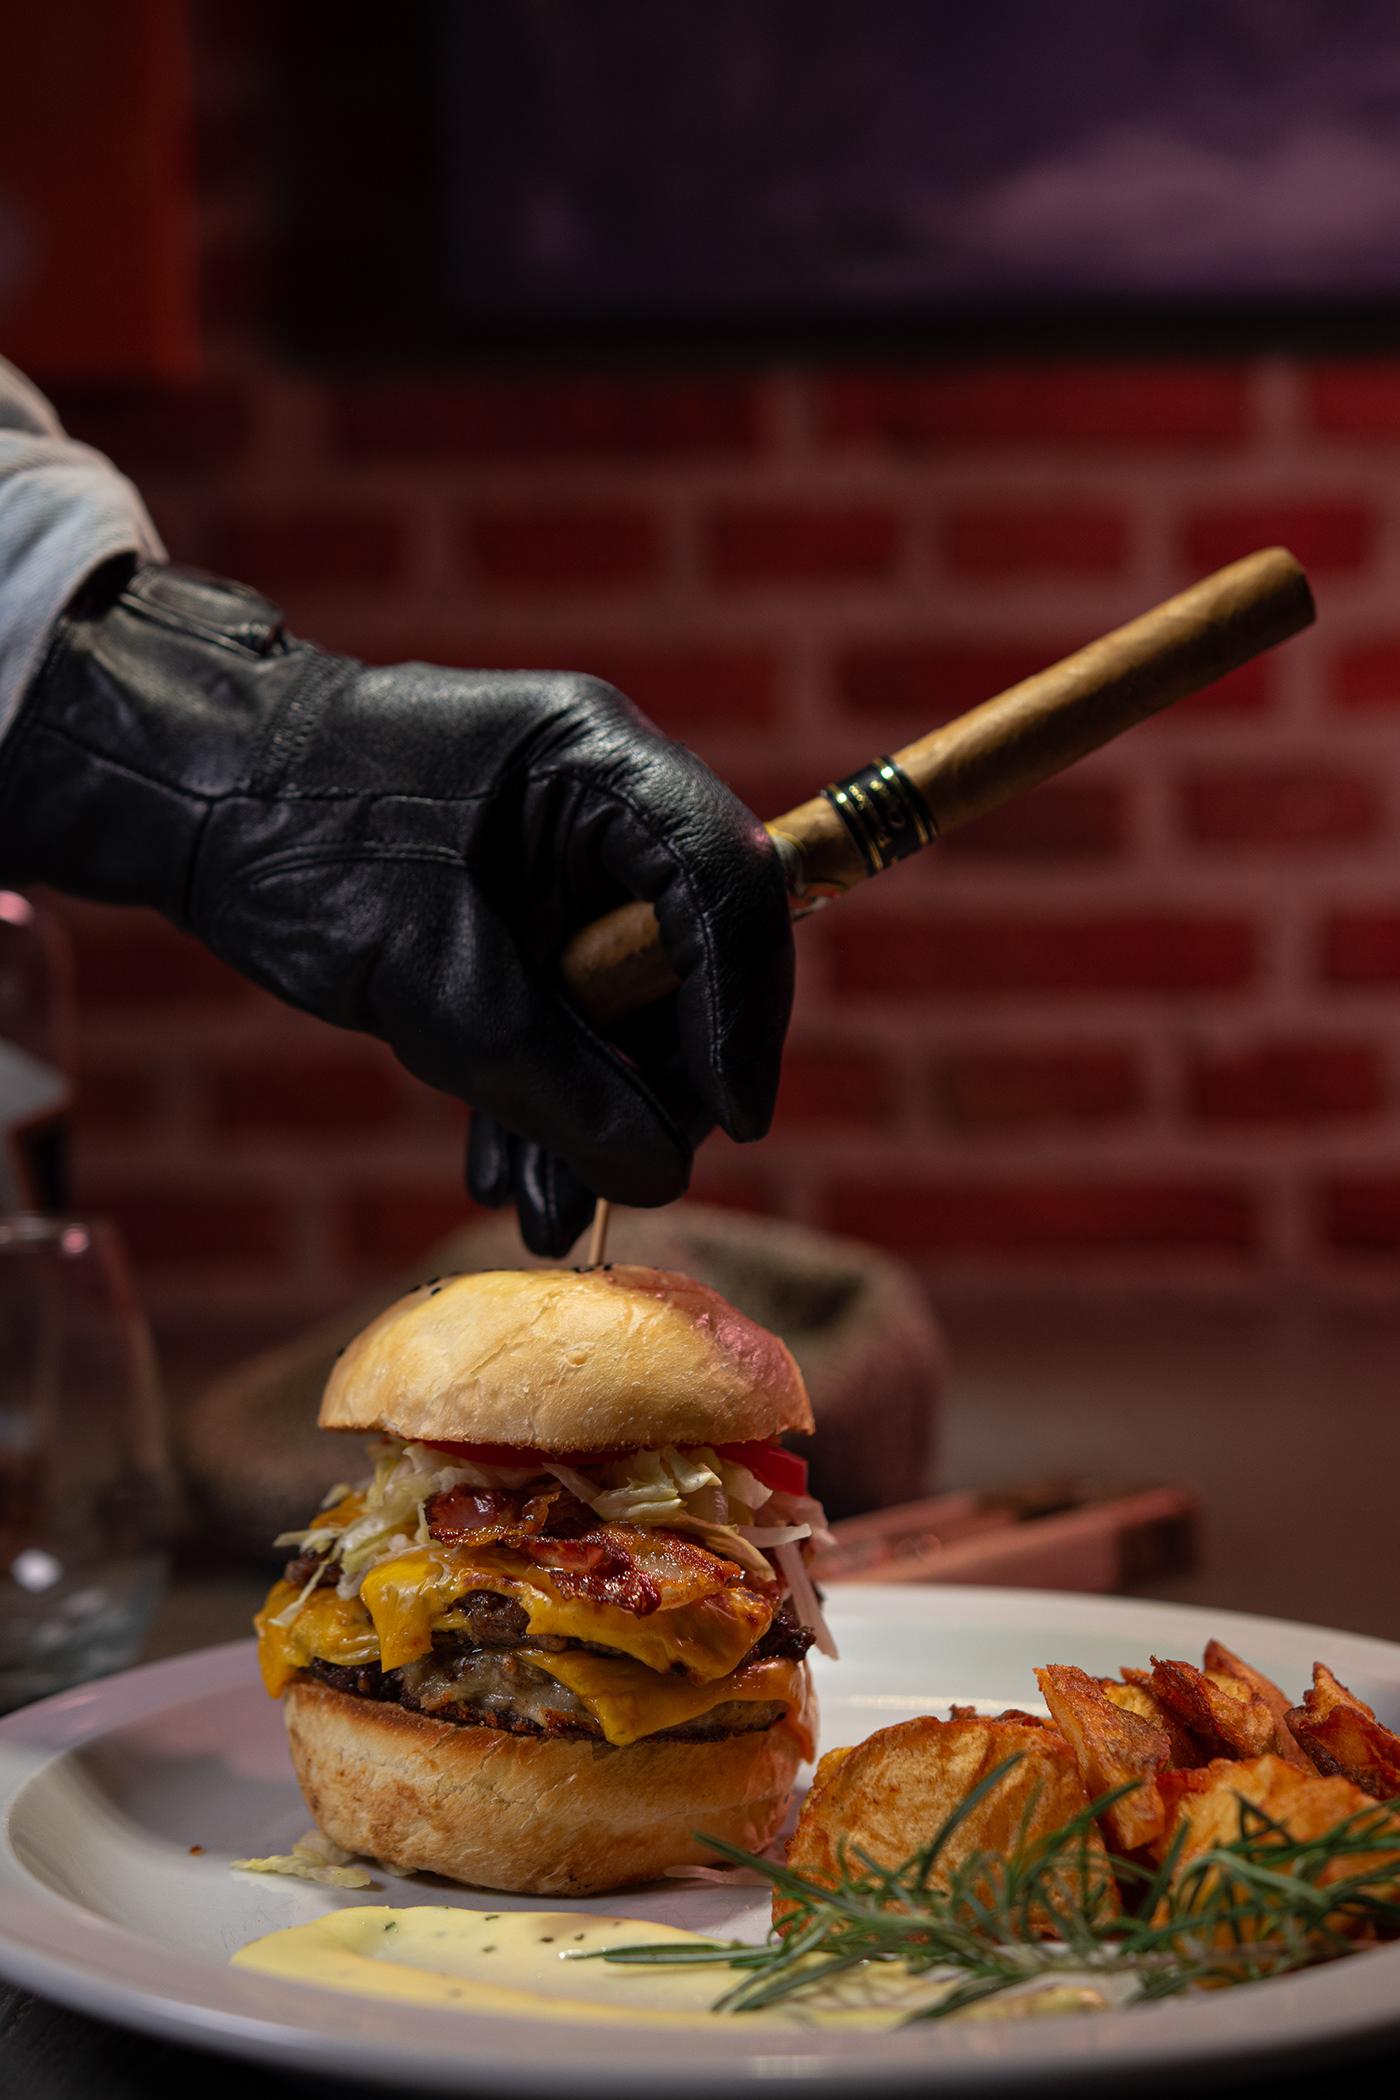 Dueño de bar cuidando su hamburguesa